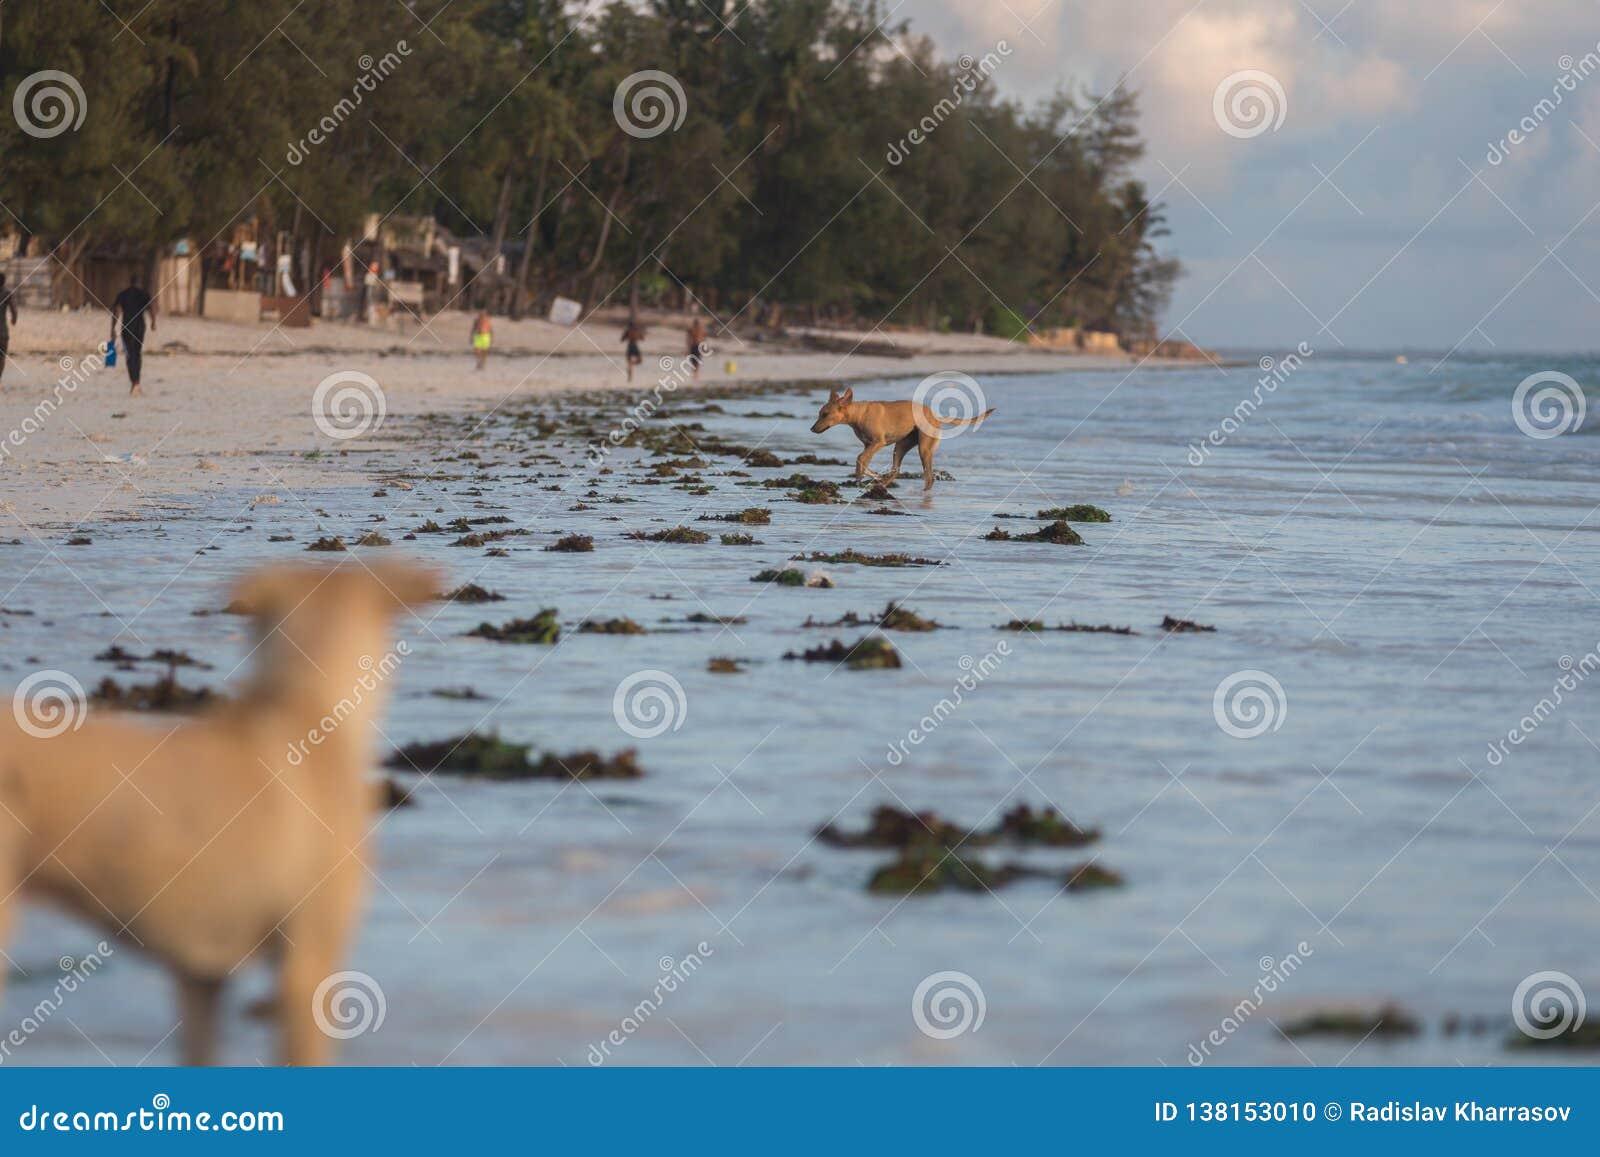 Cute dogs running on the coast. Animals of Tanzania. Pets in Zanzibar.